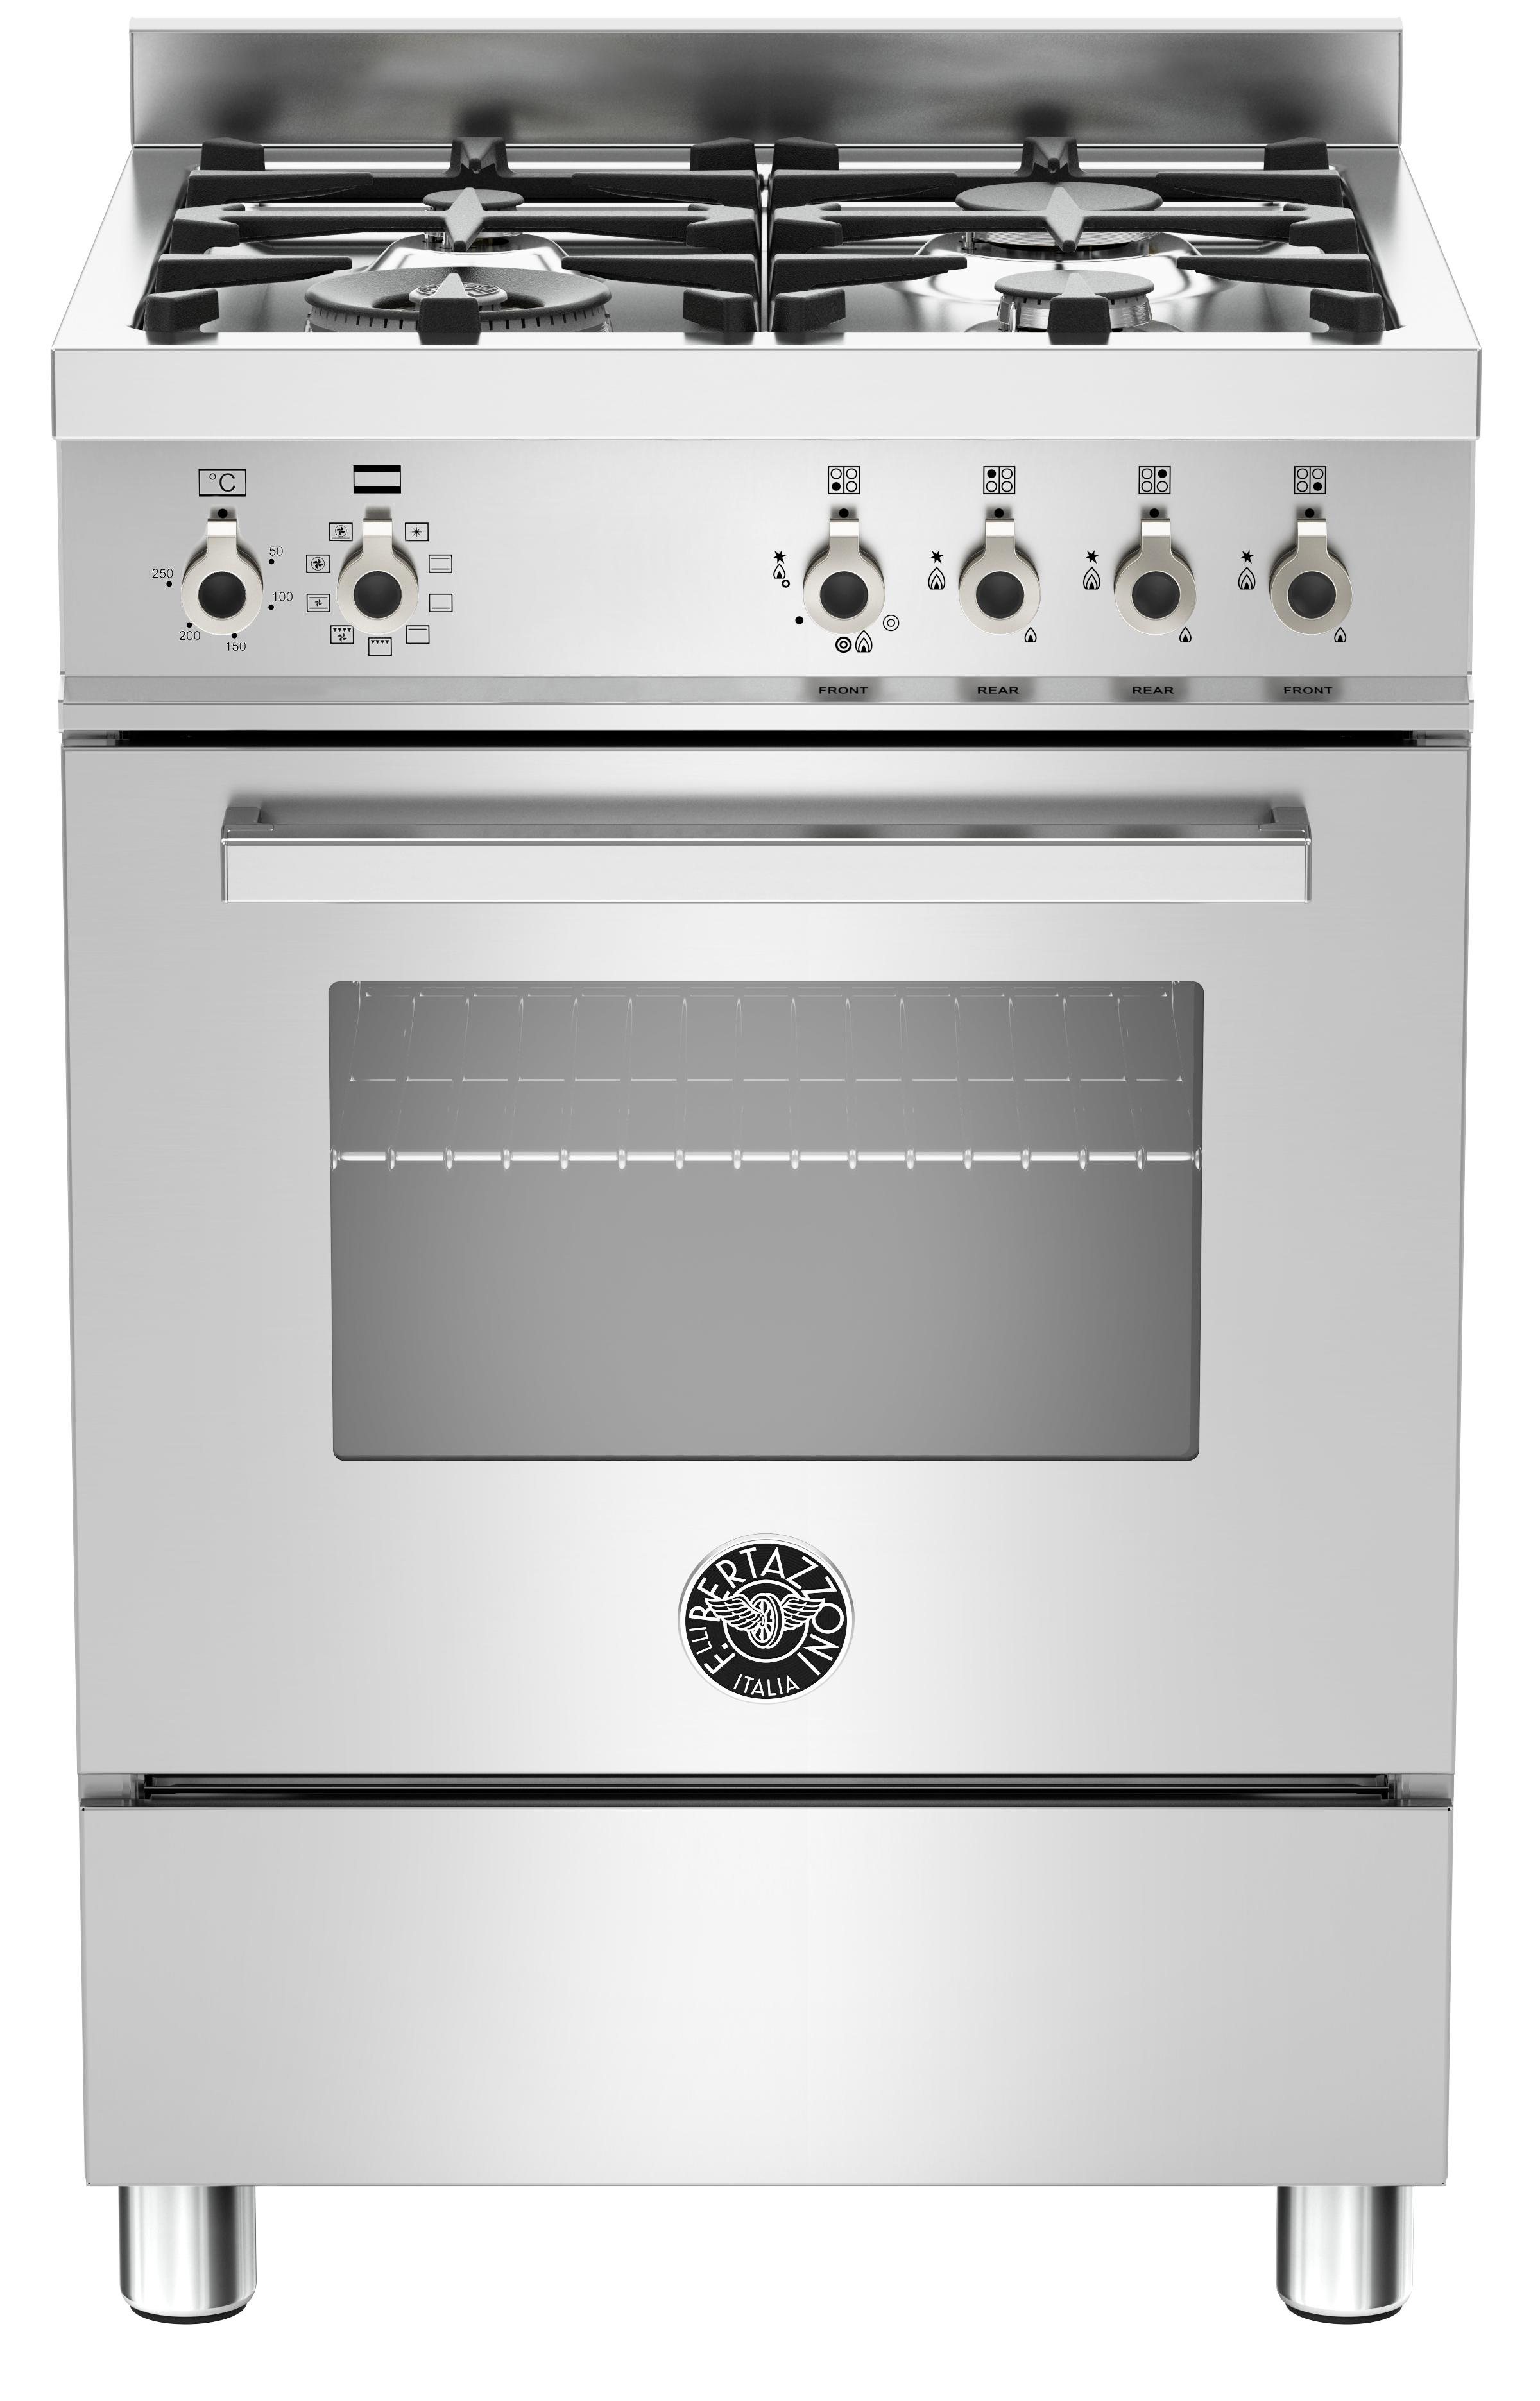 Bertazzoni PRO604 Gasspis 60 cm, 1 ugn, 4 brännare, rostfri, modell XE